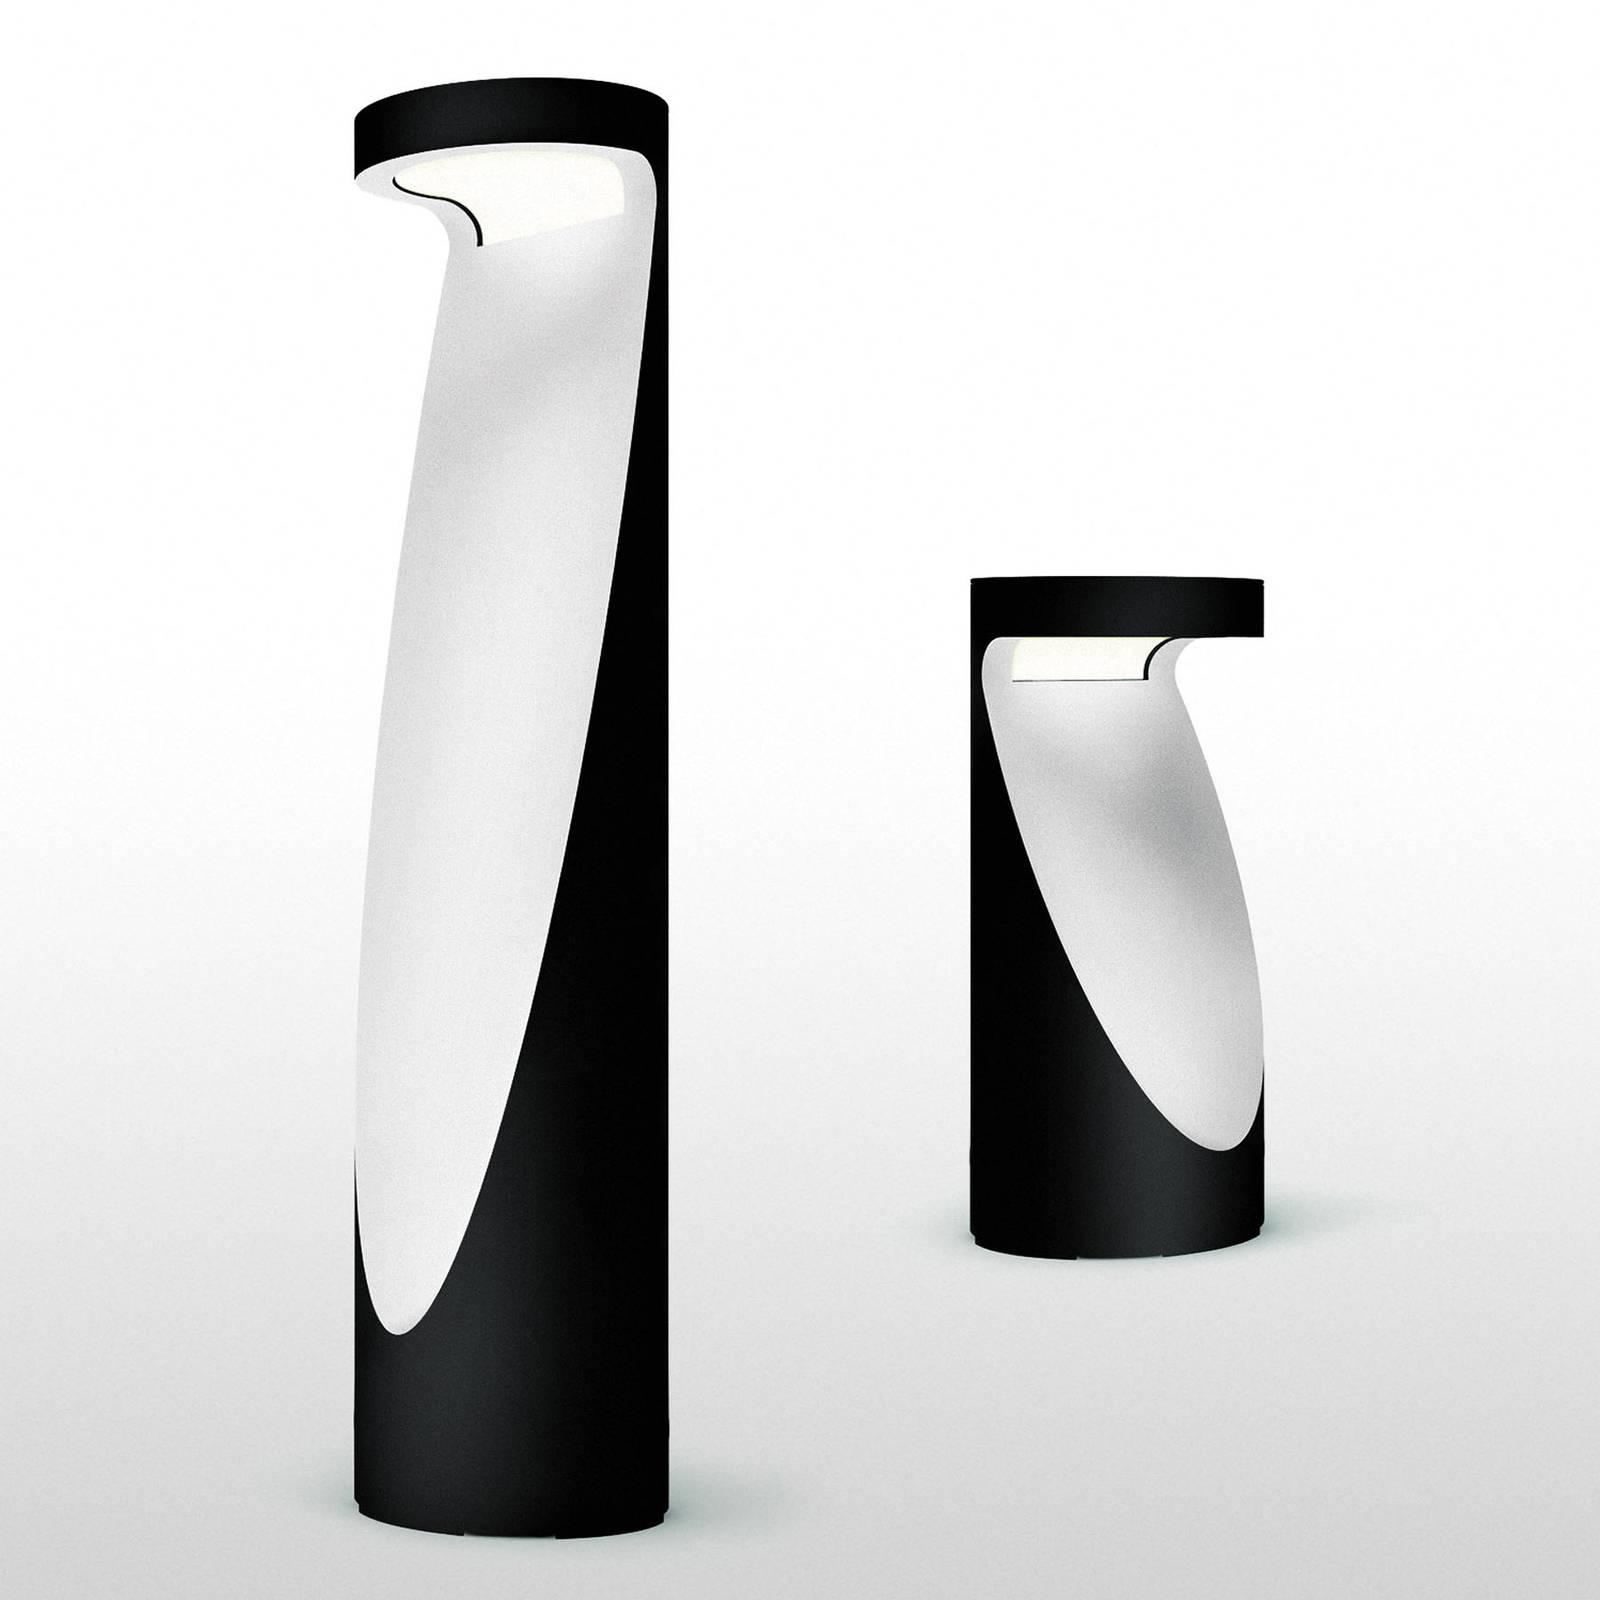 Artemide Ippolito 90 LED-Wegeleuchte